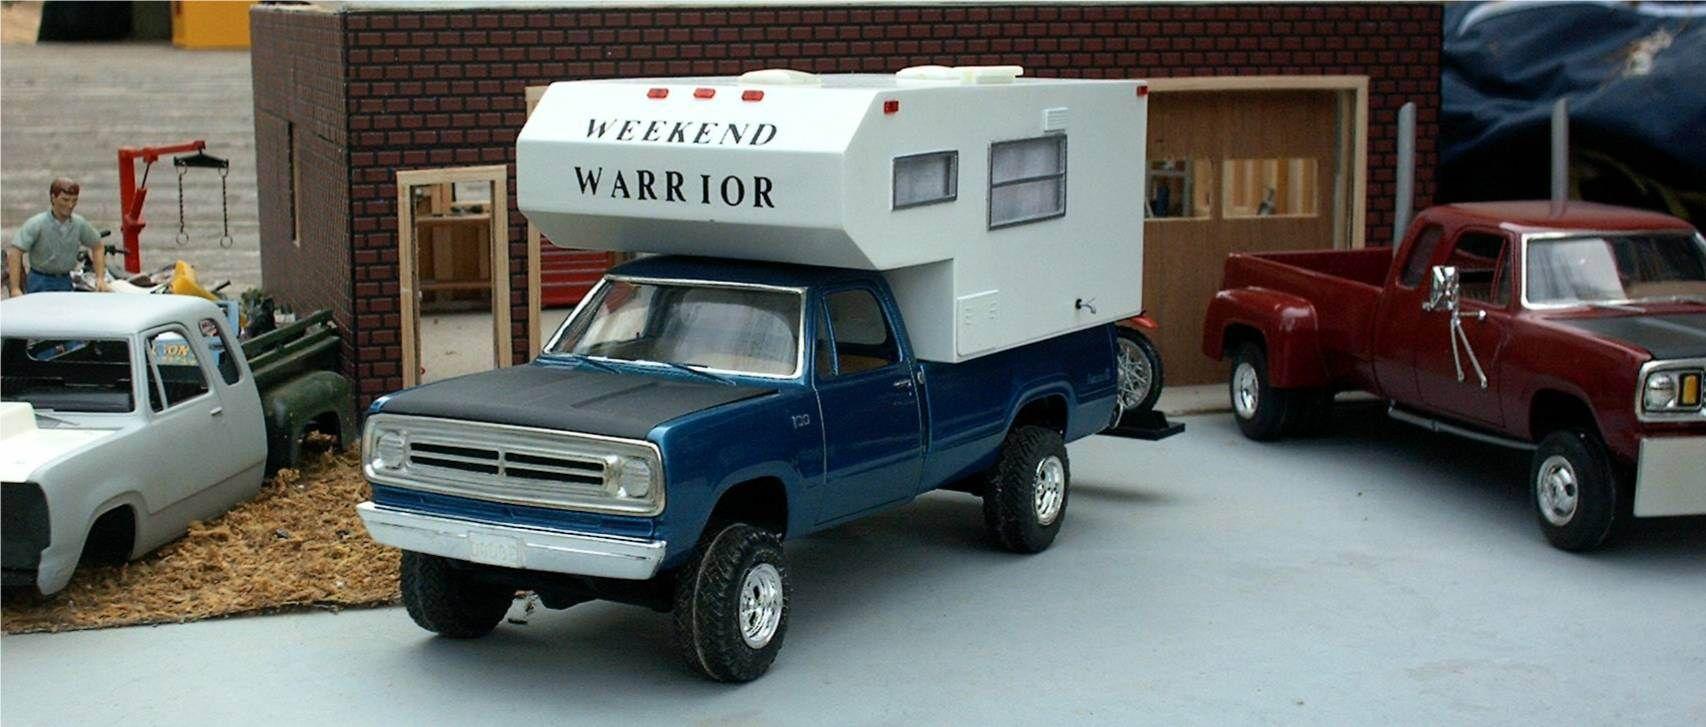 Junkyard Models Dodge Pickup Truck Camper & Dirt Bike